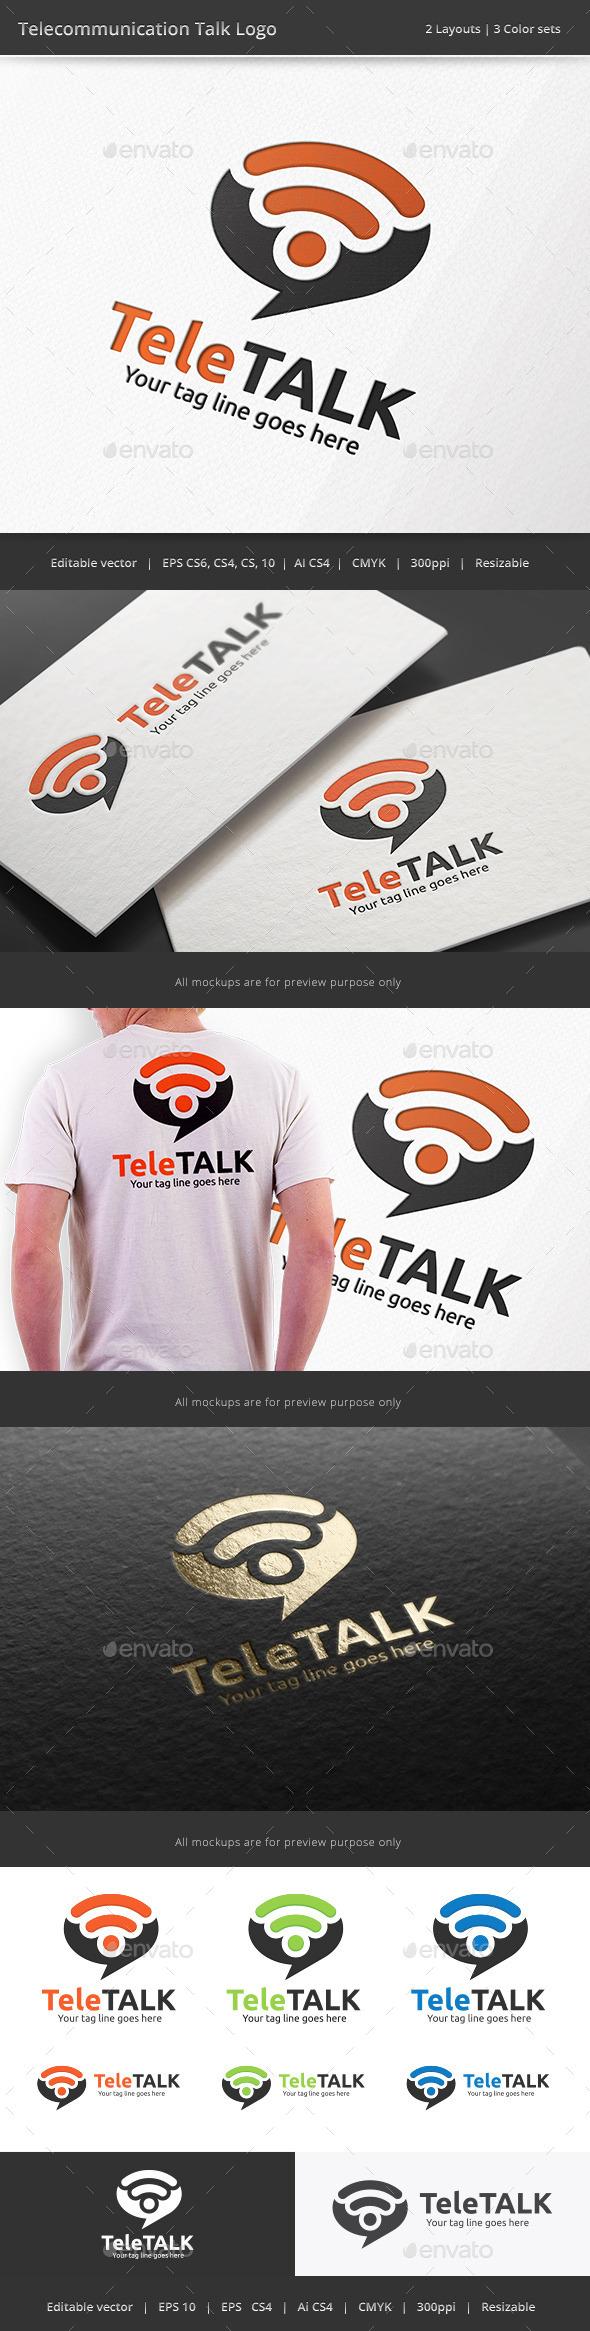 GraphicRiver Telecommunication Talk Logo 10242211